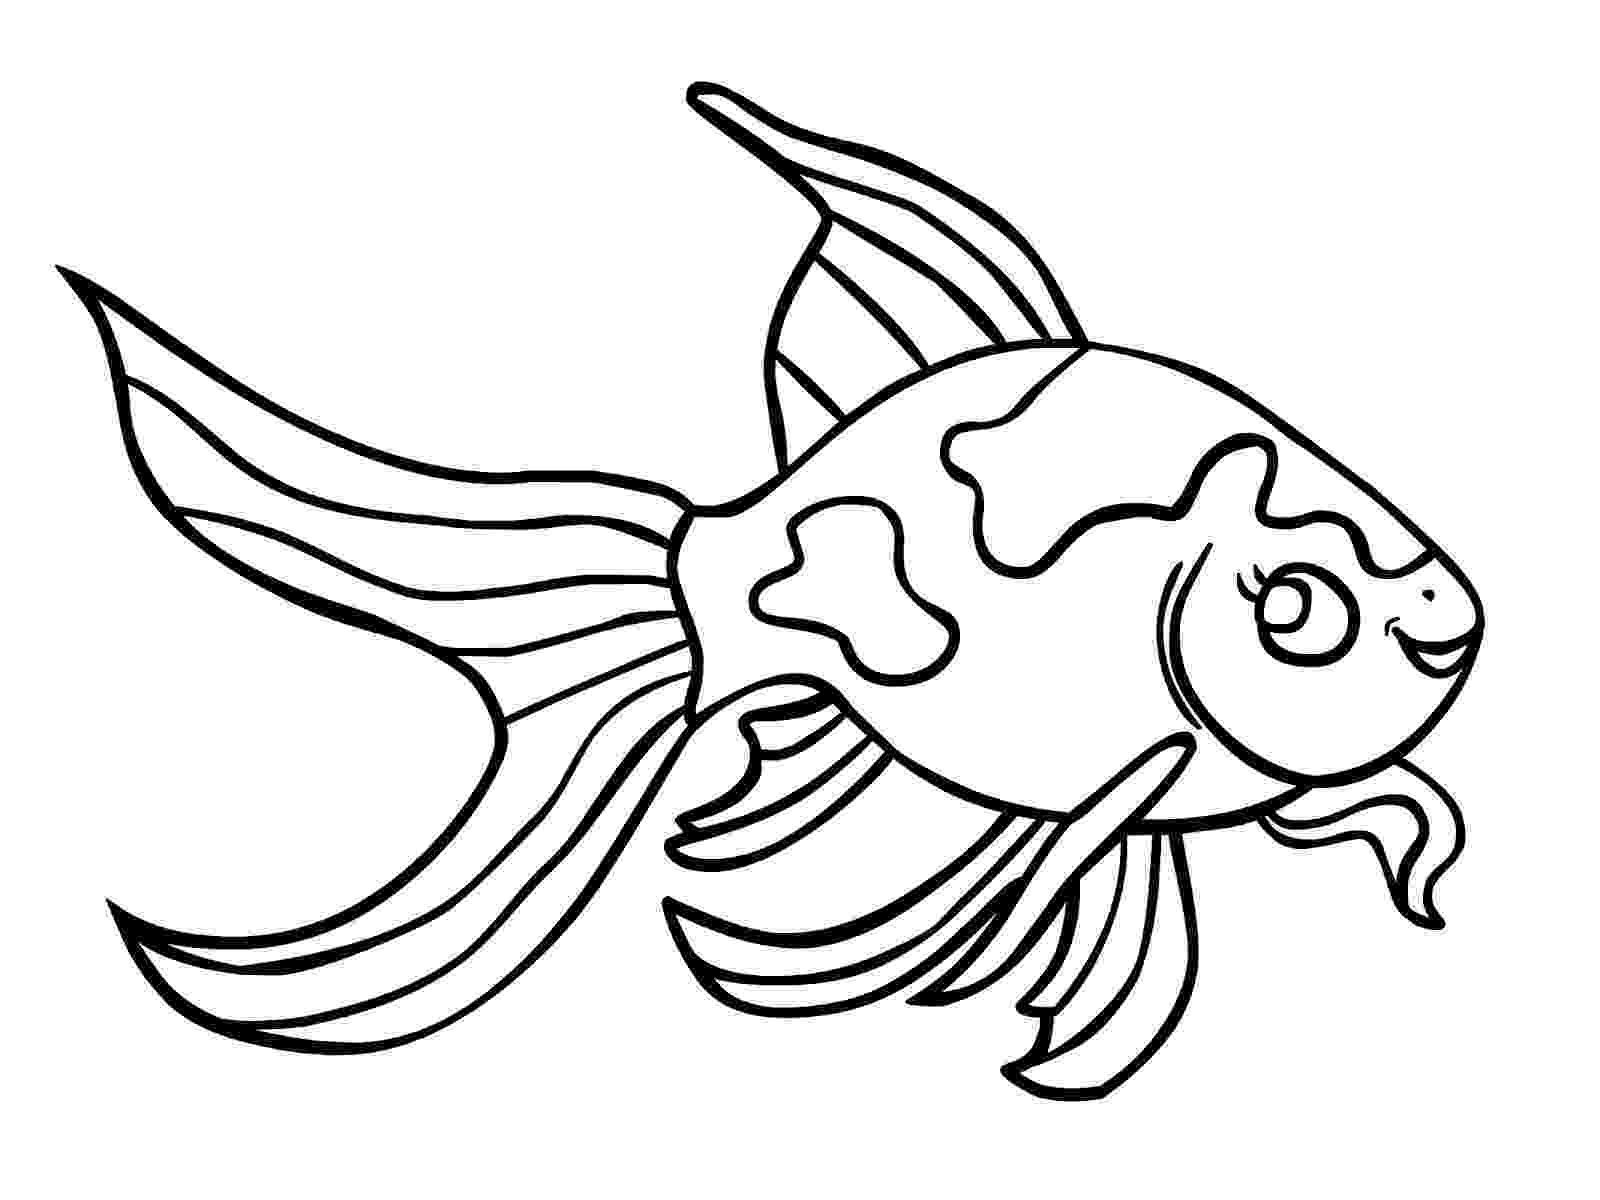 goldfish coloring page printable goldfish coloring pages for kids cool2bkids page coloring goldfish 1 2